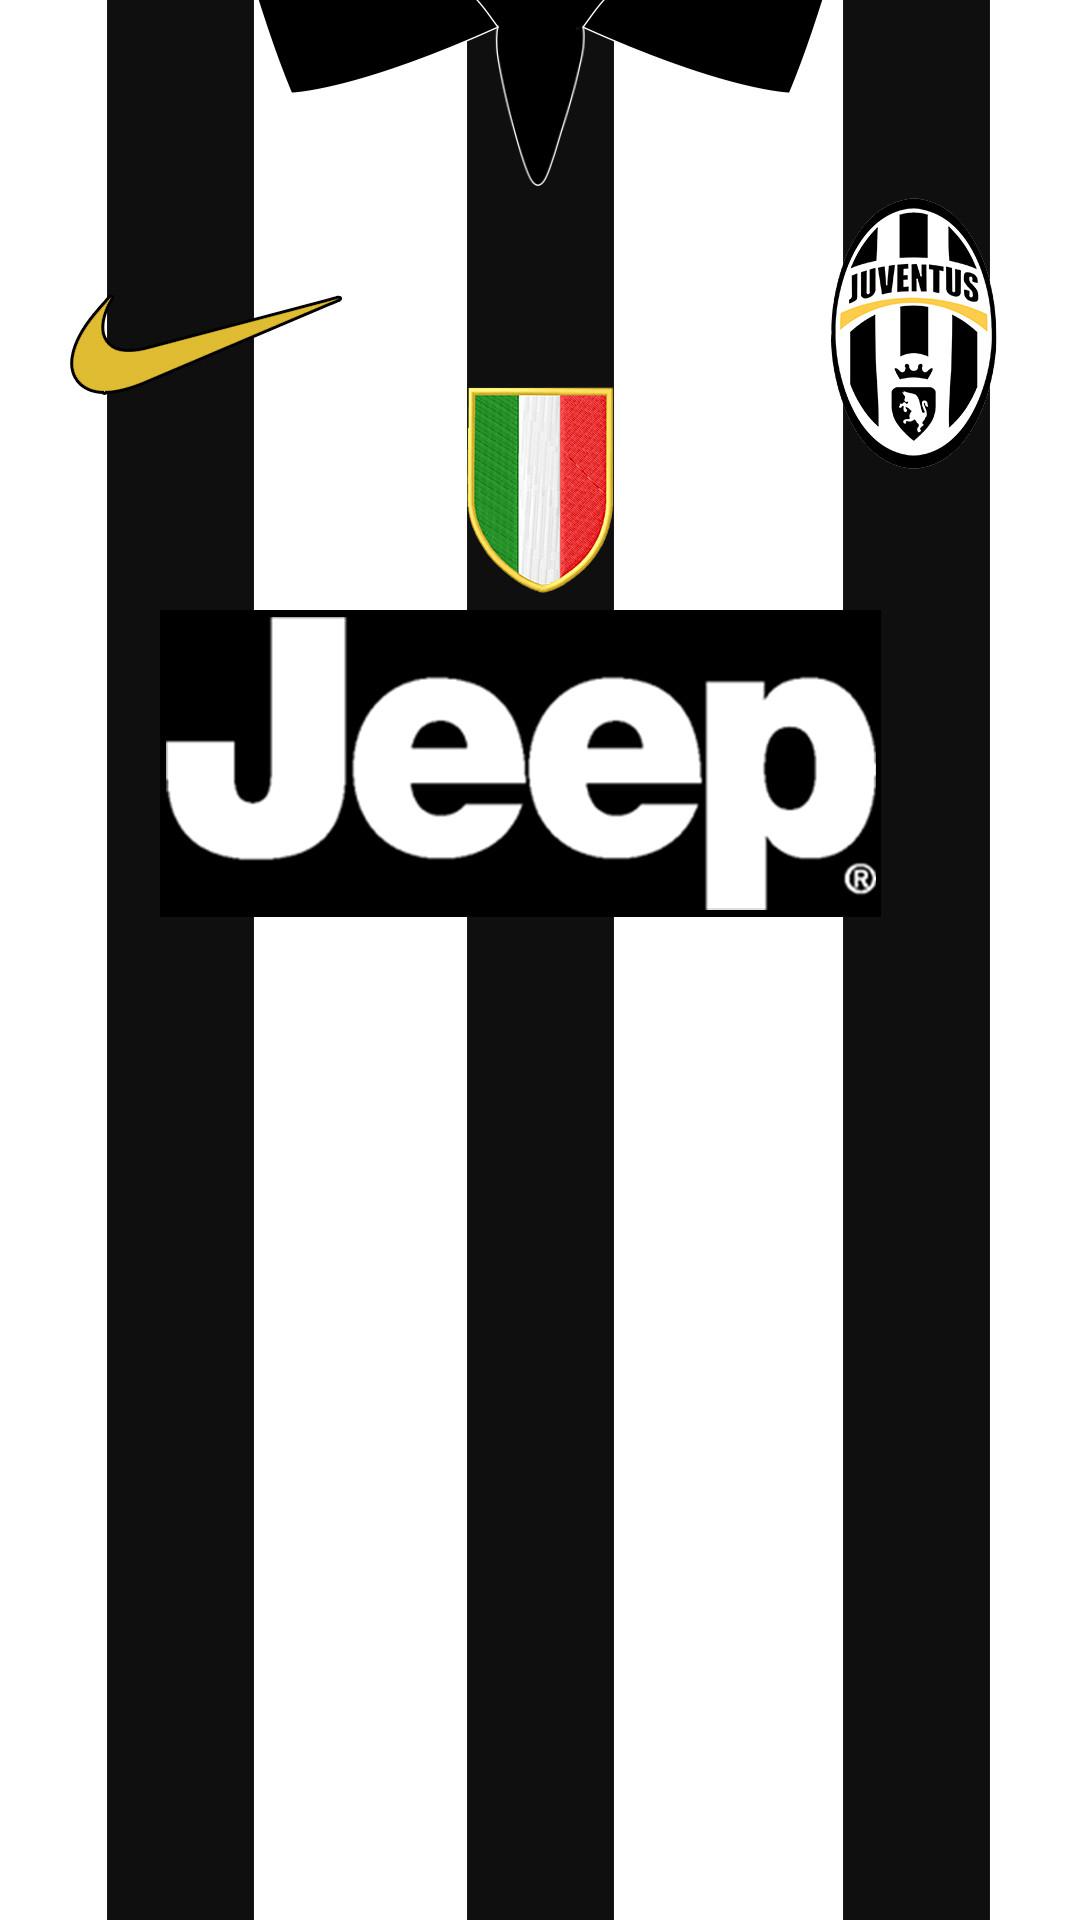 Wallpaper Chelsea 3d Android Logo Juventus Wallpaper 2018 75 Images